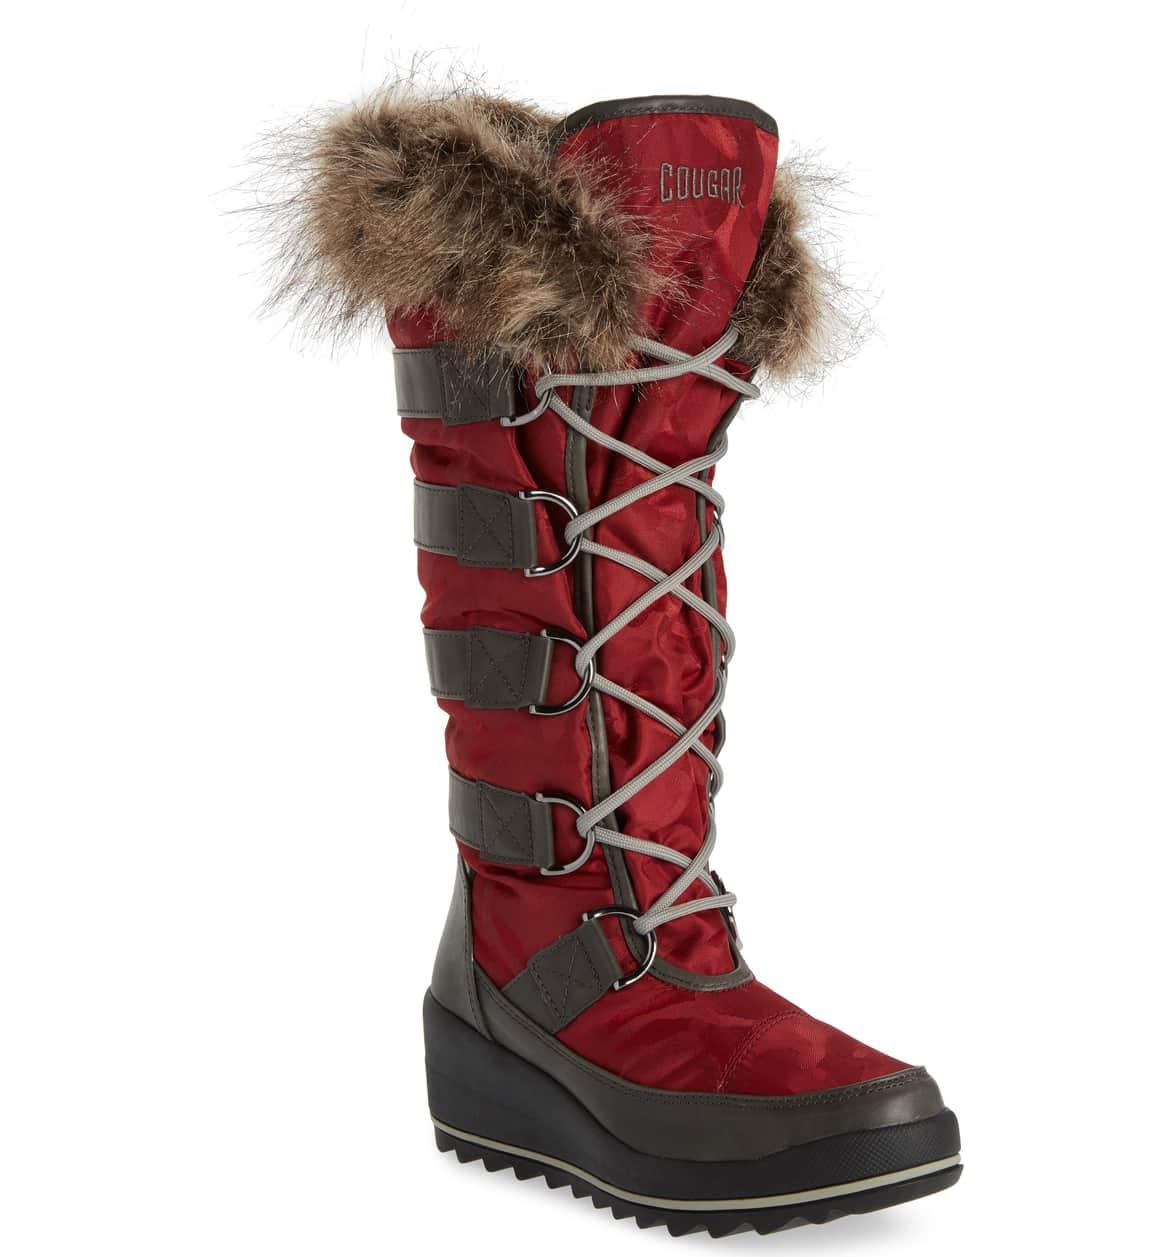 Stylish Warm Winter Boots that Grab the Eye, women's fur trim snow boots, Cougar Lancaster Waterproof Snow Boot, red fur trim snow boots